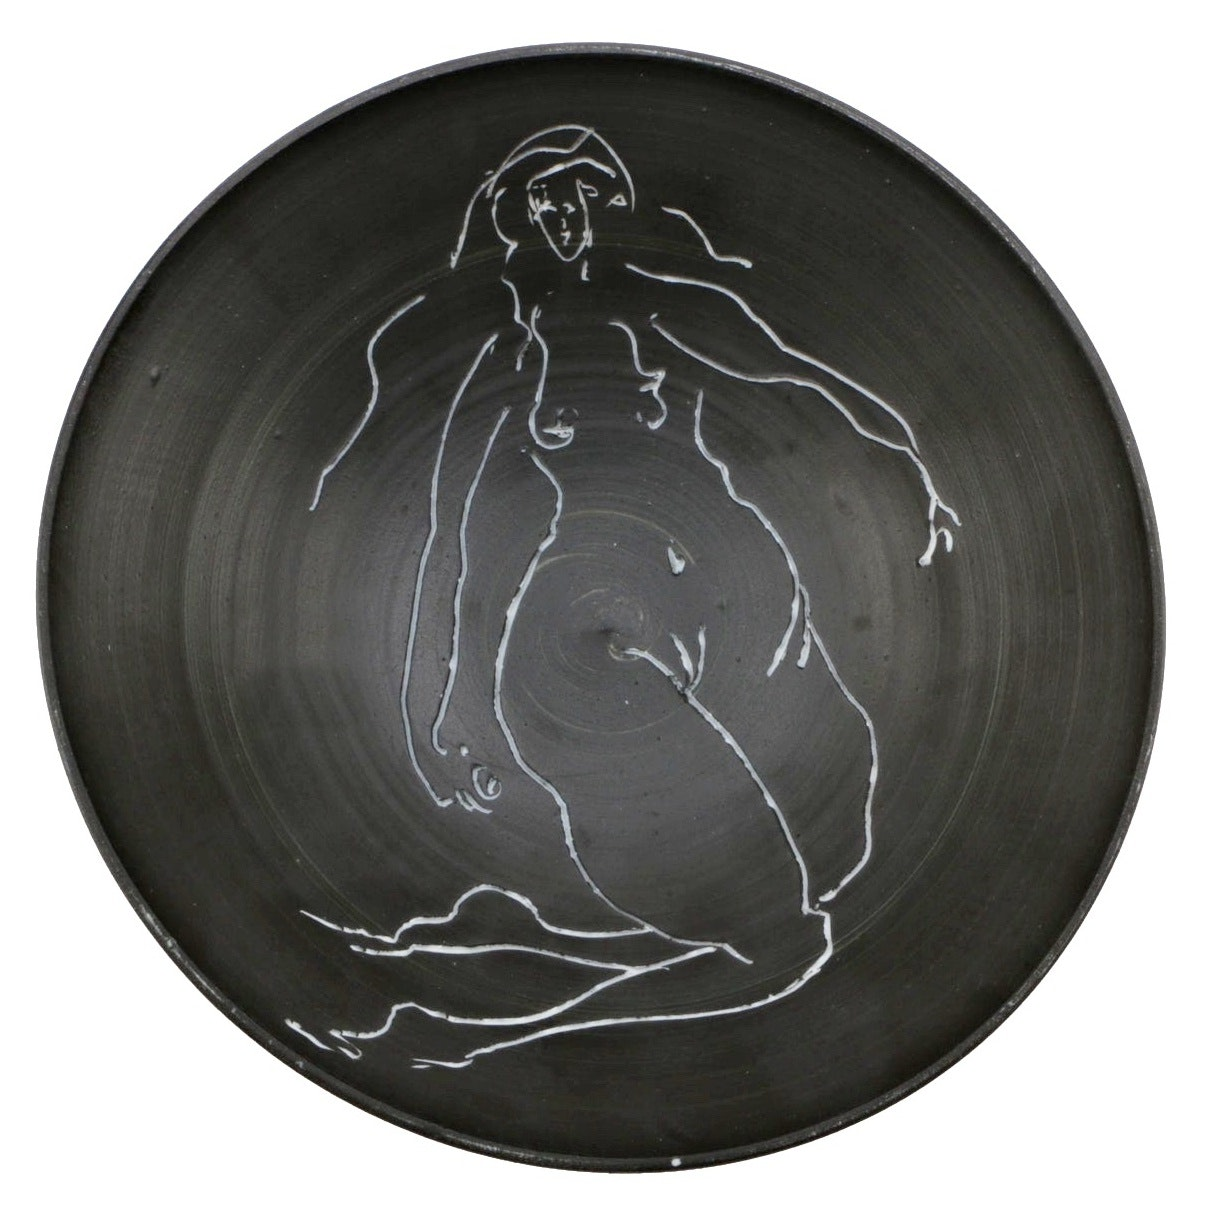 "Edward Eberle 2009 Porcelain Sgraffito Bowl ""Figure Redux #1"""